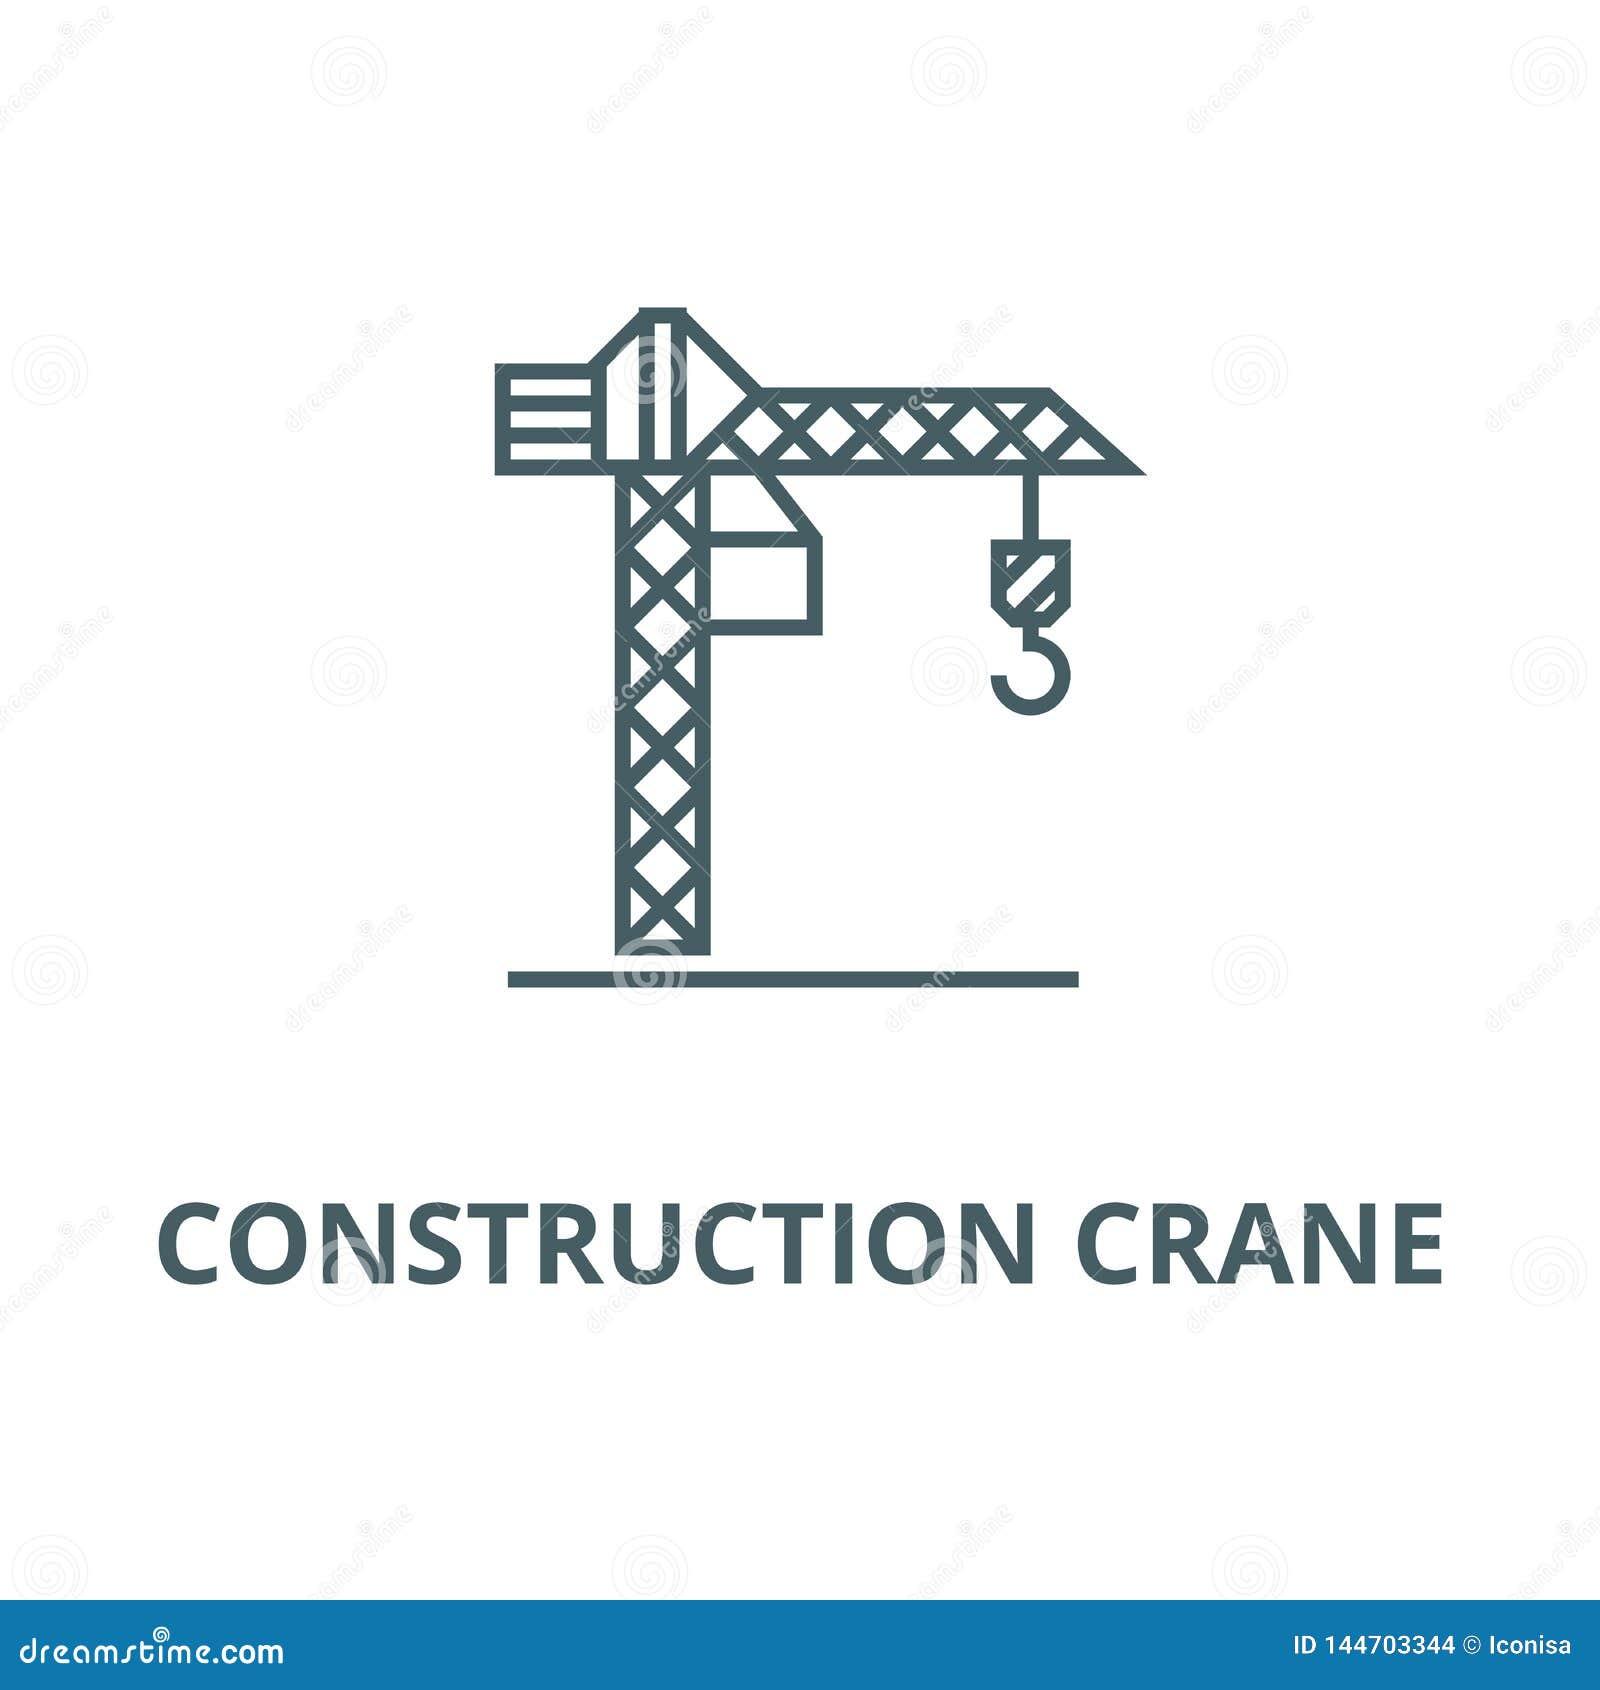 construction icon crane icon engineering icon clipart - Technology, Symbol,  Gadget, transparent clip art